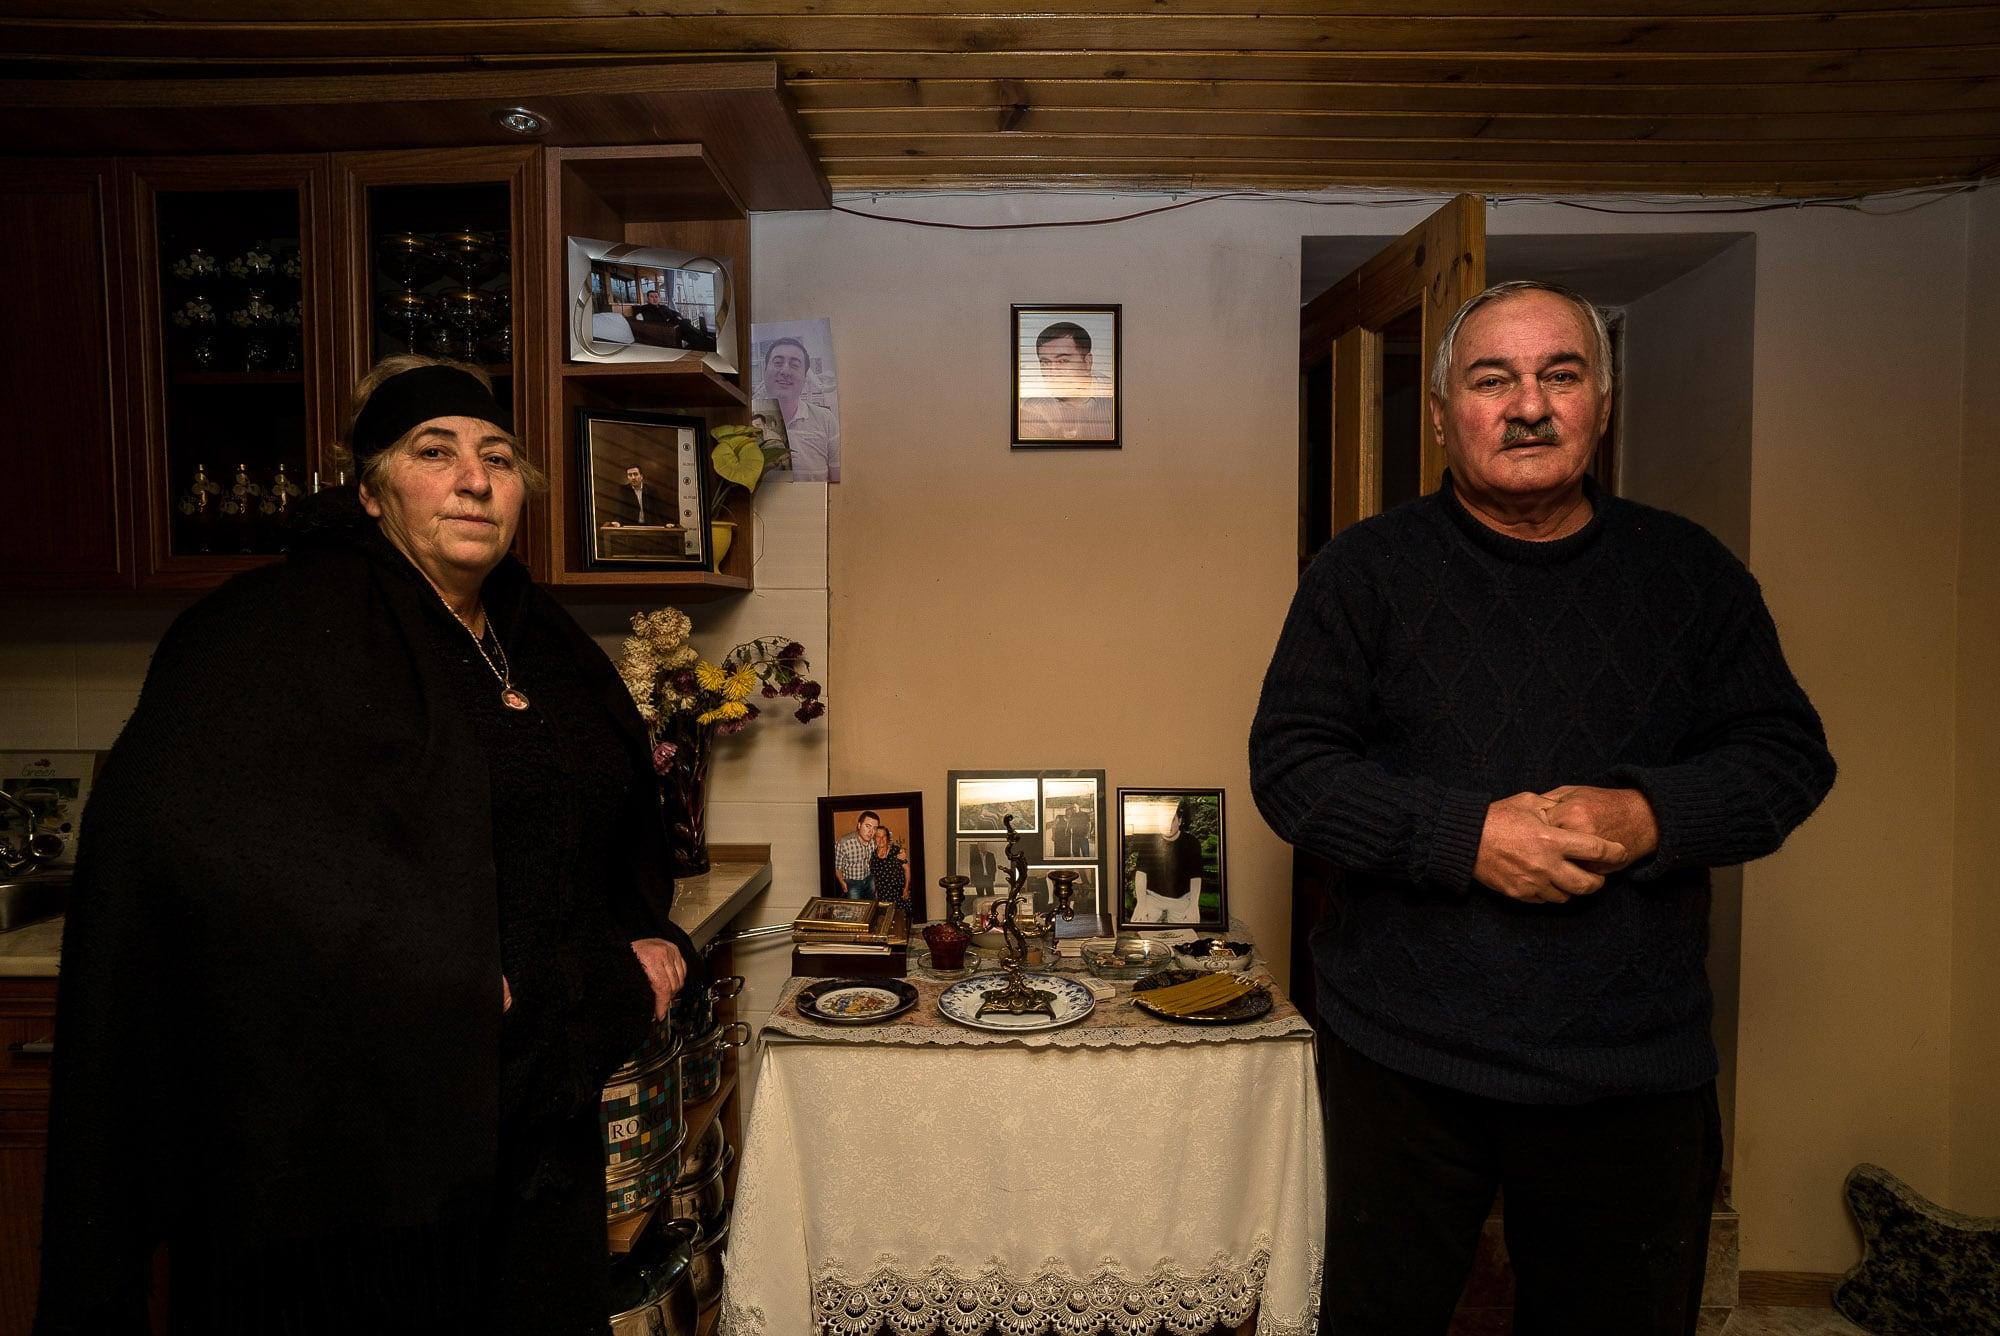 Nino and Nugsari with pictures of Ramazi